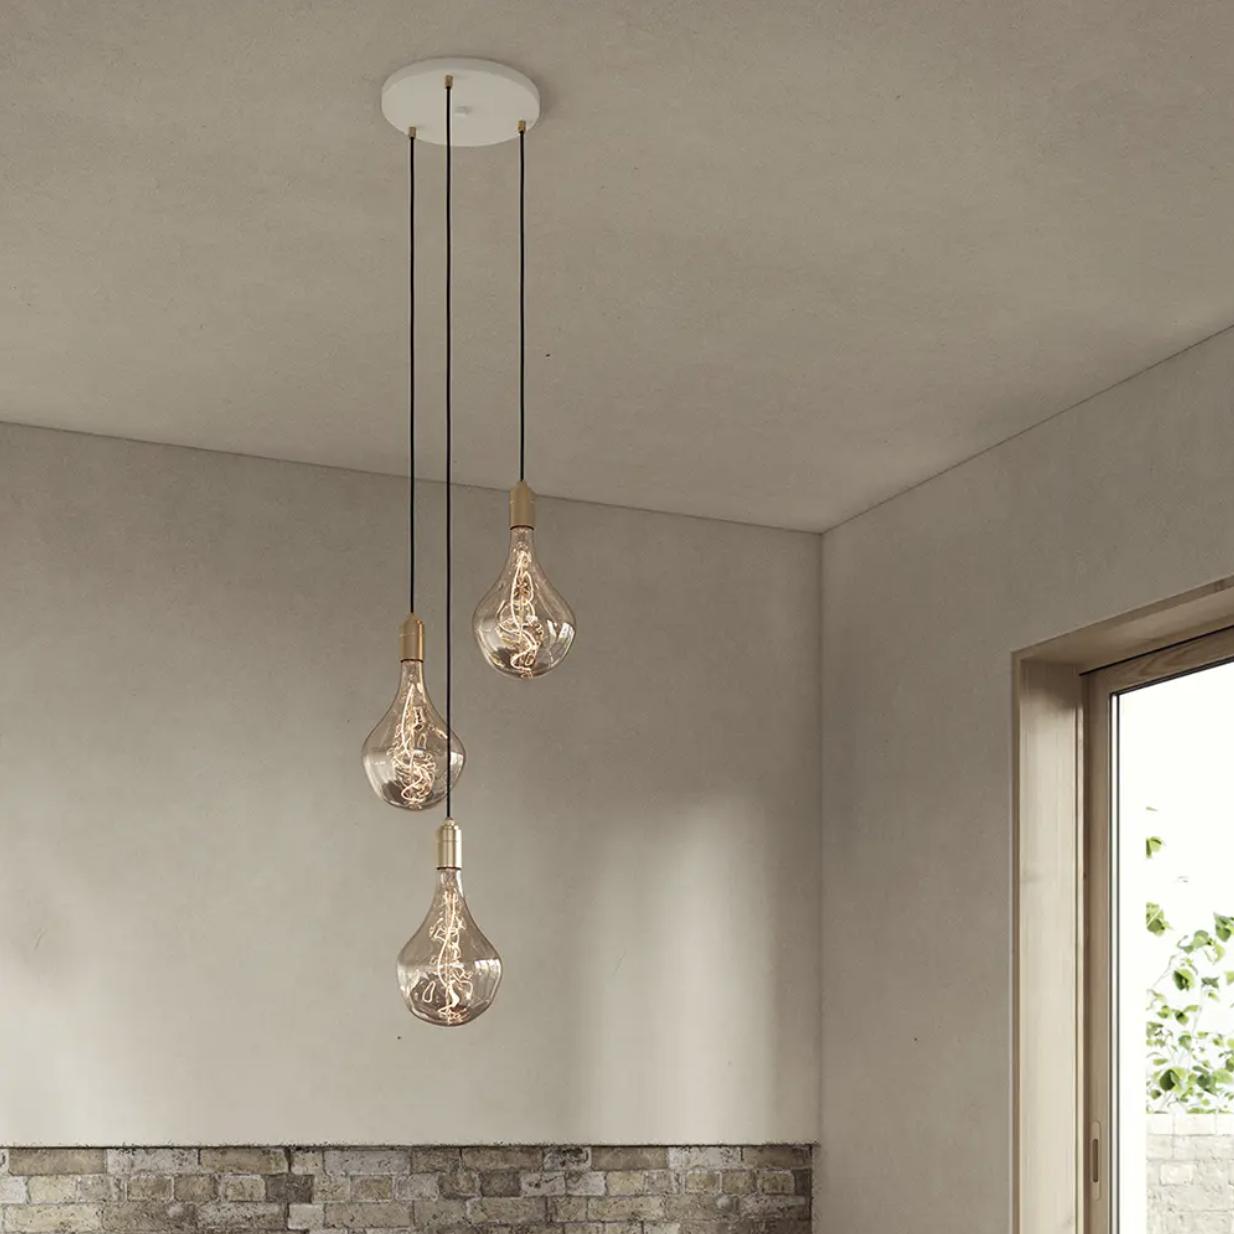 Triple Pendant With Voronoi II